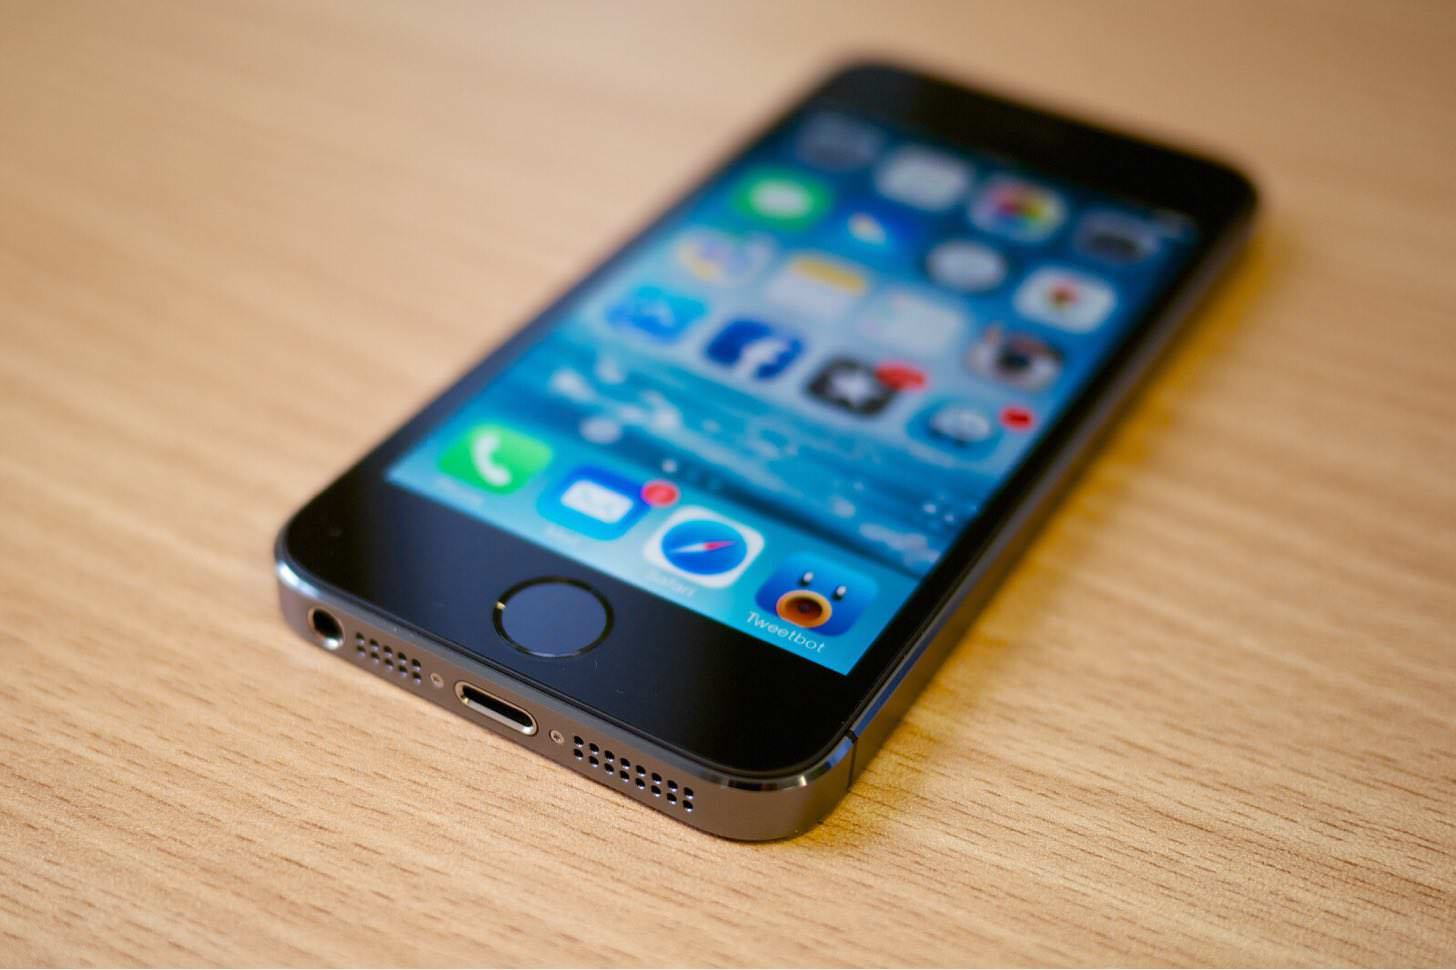 iPhone 5seは、iPhone 6sと同じ頭脳?